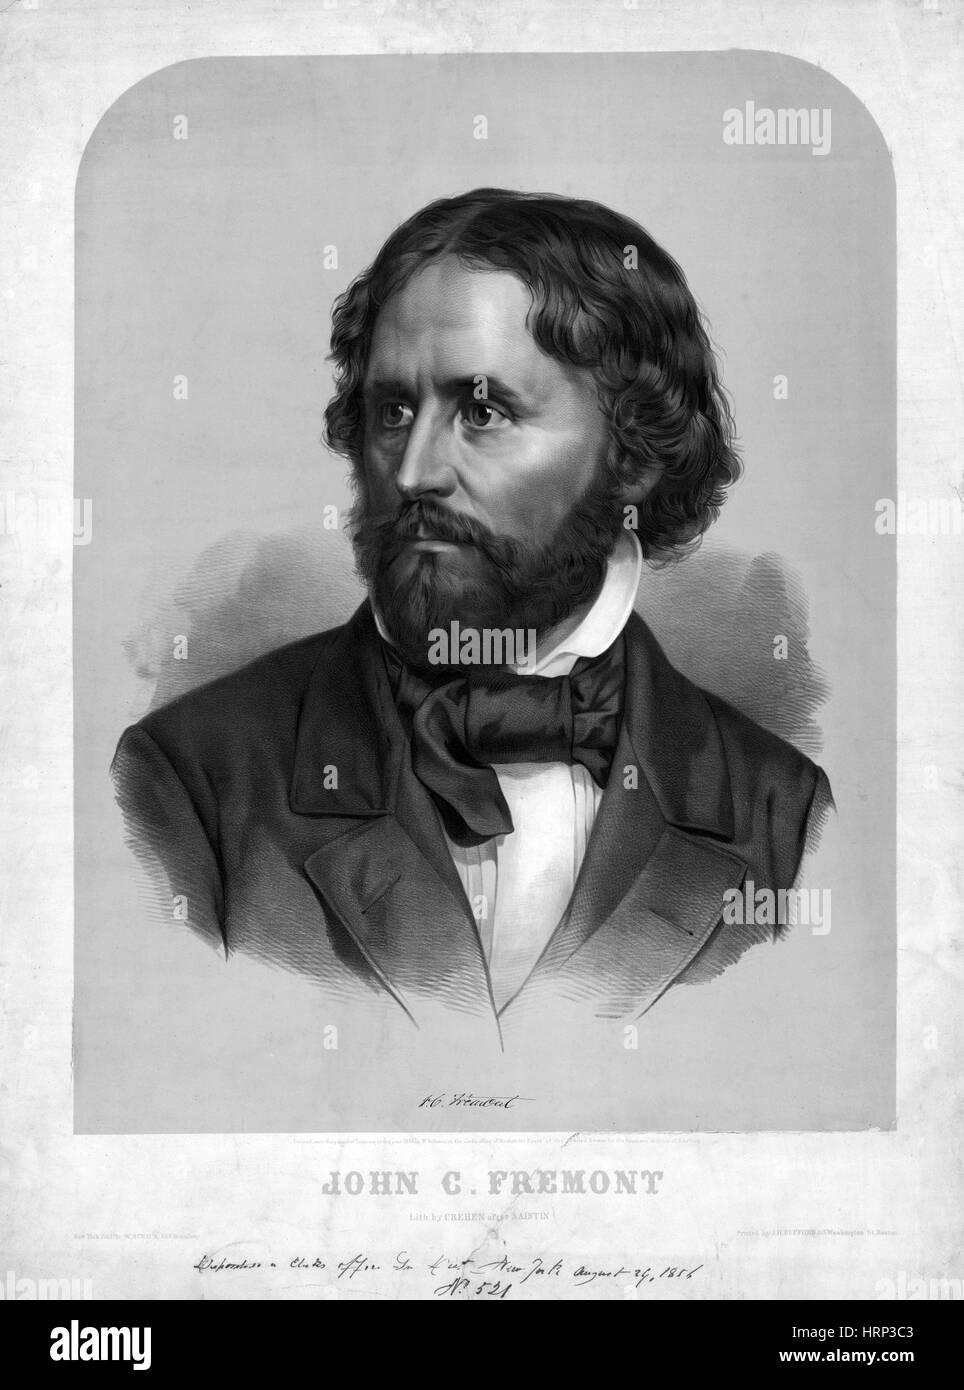 John Charles Fr̩mont, American Civil War Officer - Stock Image